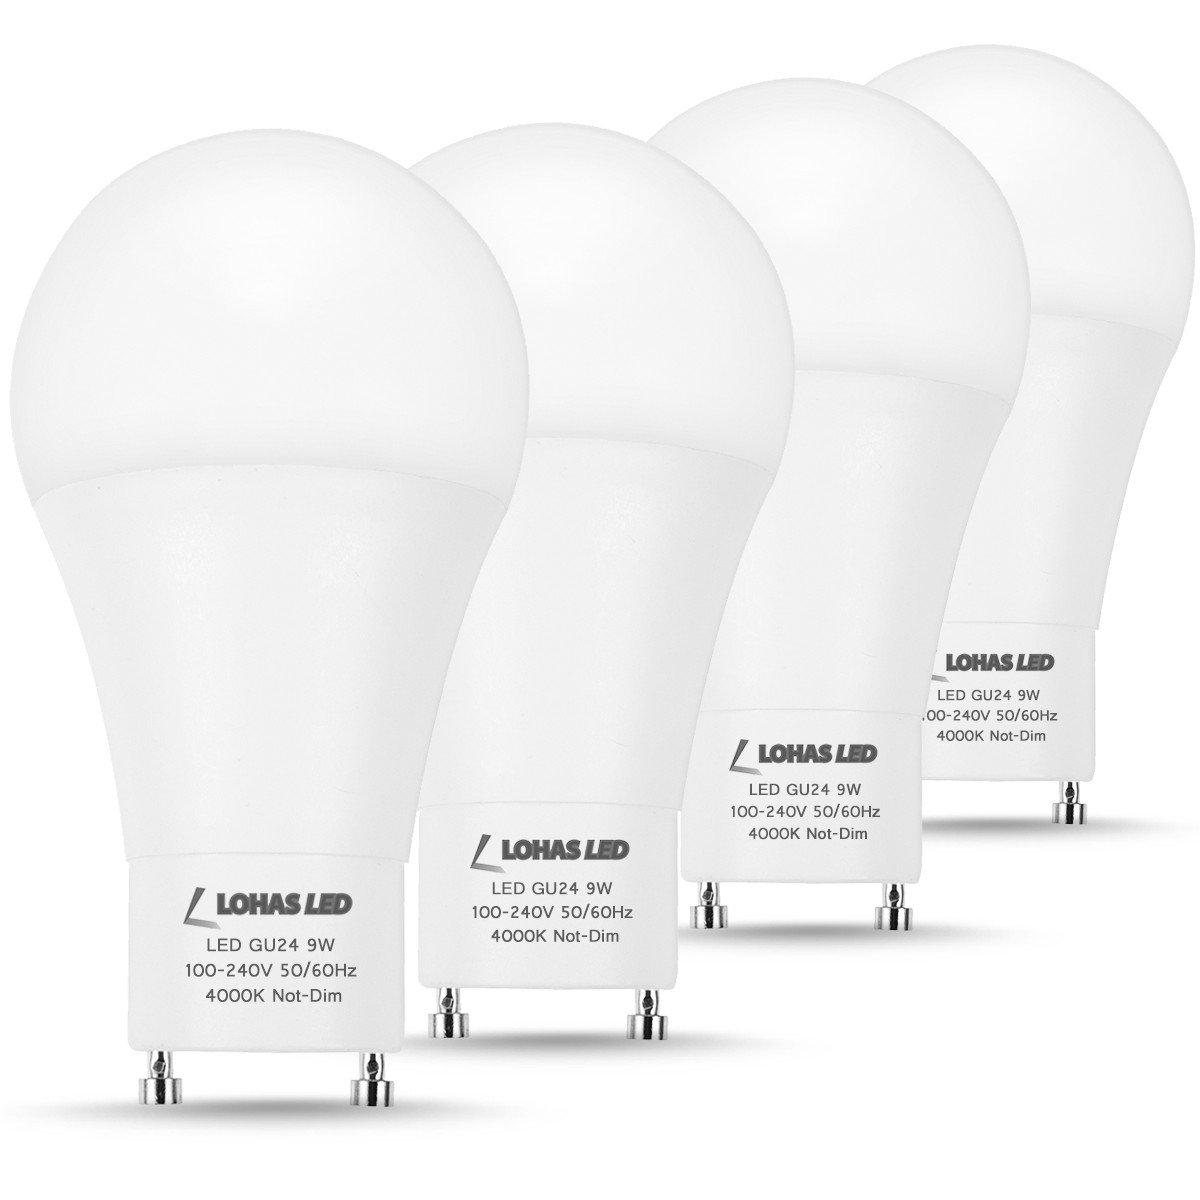 LOHAS GU24 Base LED Bulb A19, 60W Light Bulb Equivalent(9W LED), GU24 4000K Bulbs Natural Cool Daylight, 810 Lumens, Not Dimmable, No GU24 Adapter Needed, 120V, Energy Saving Lighting Bulb(Pack of 4)